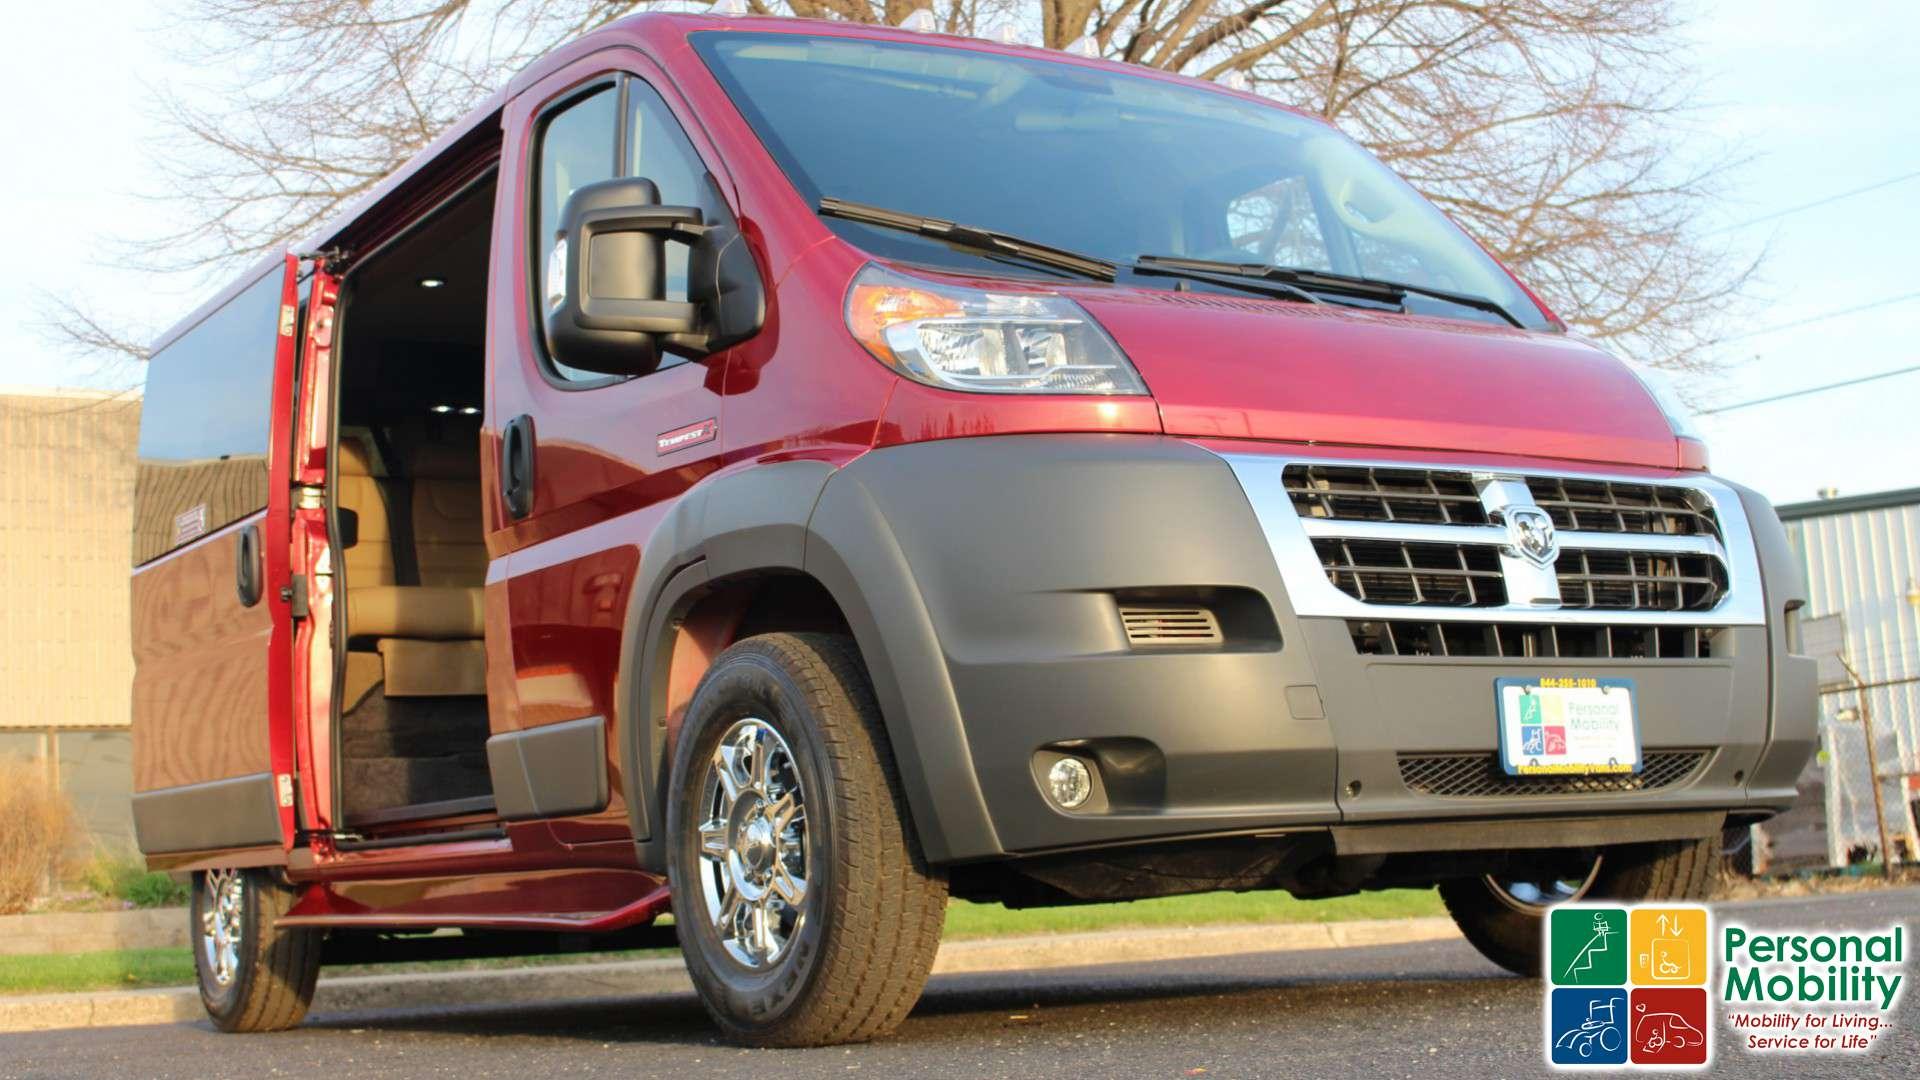 2018 Ram Promaster Cargo Van | Stock: JE117833 | Wheelchair